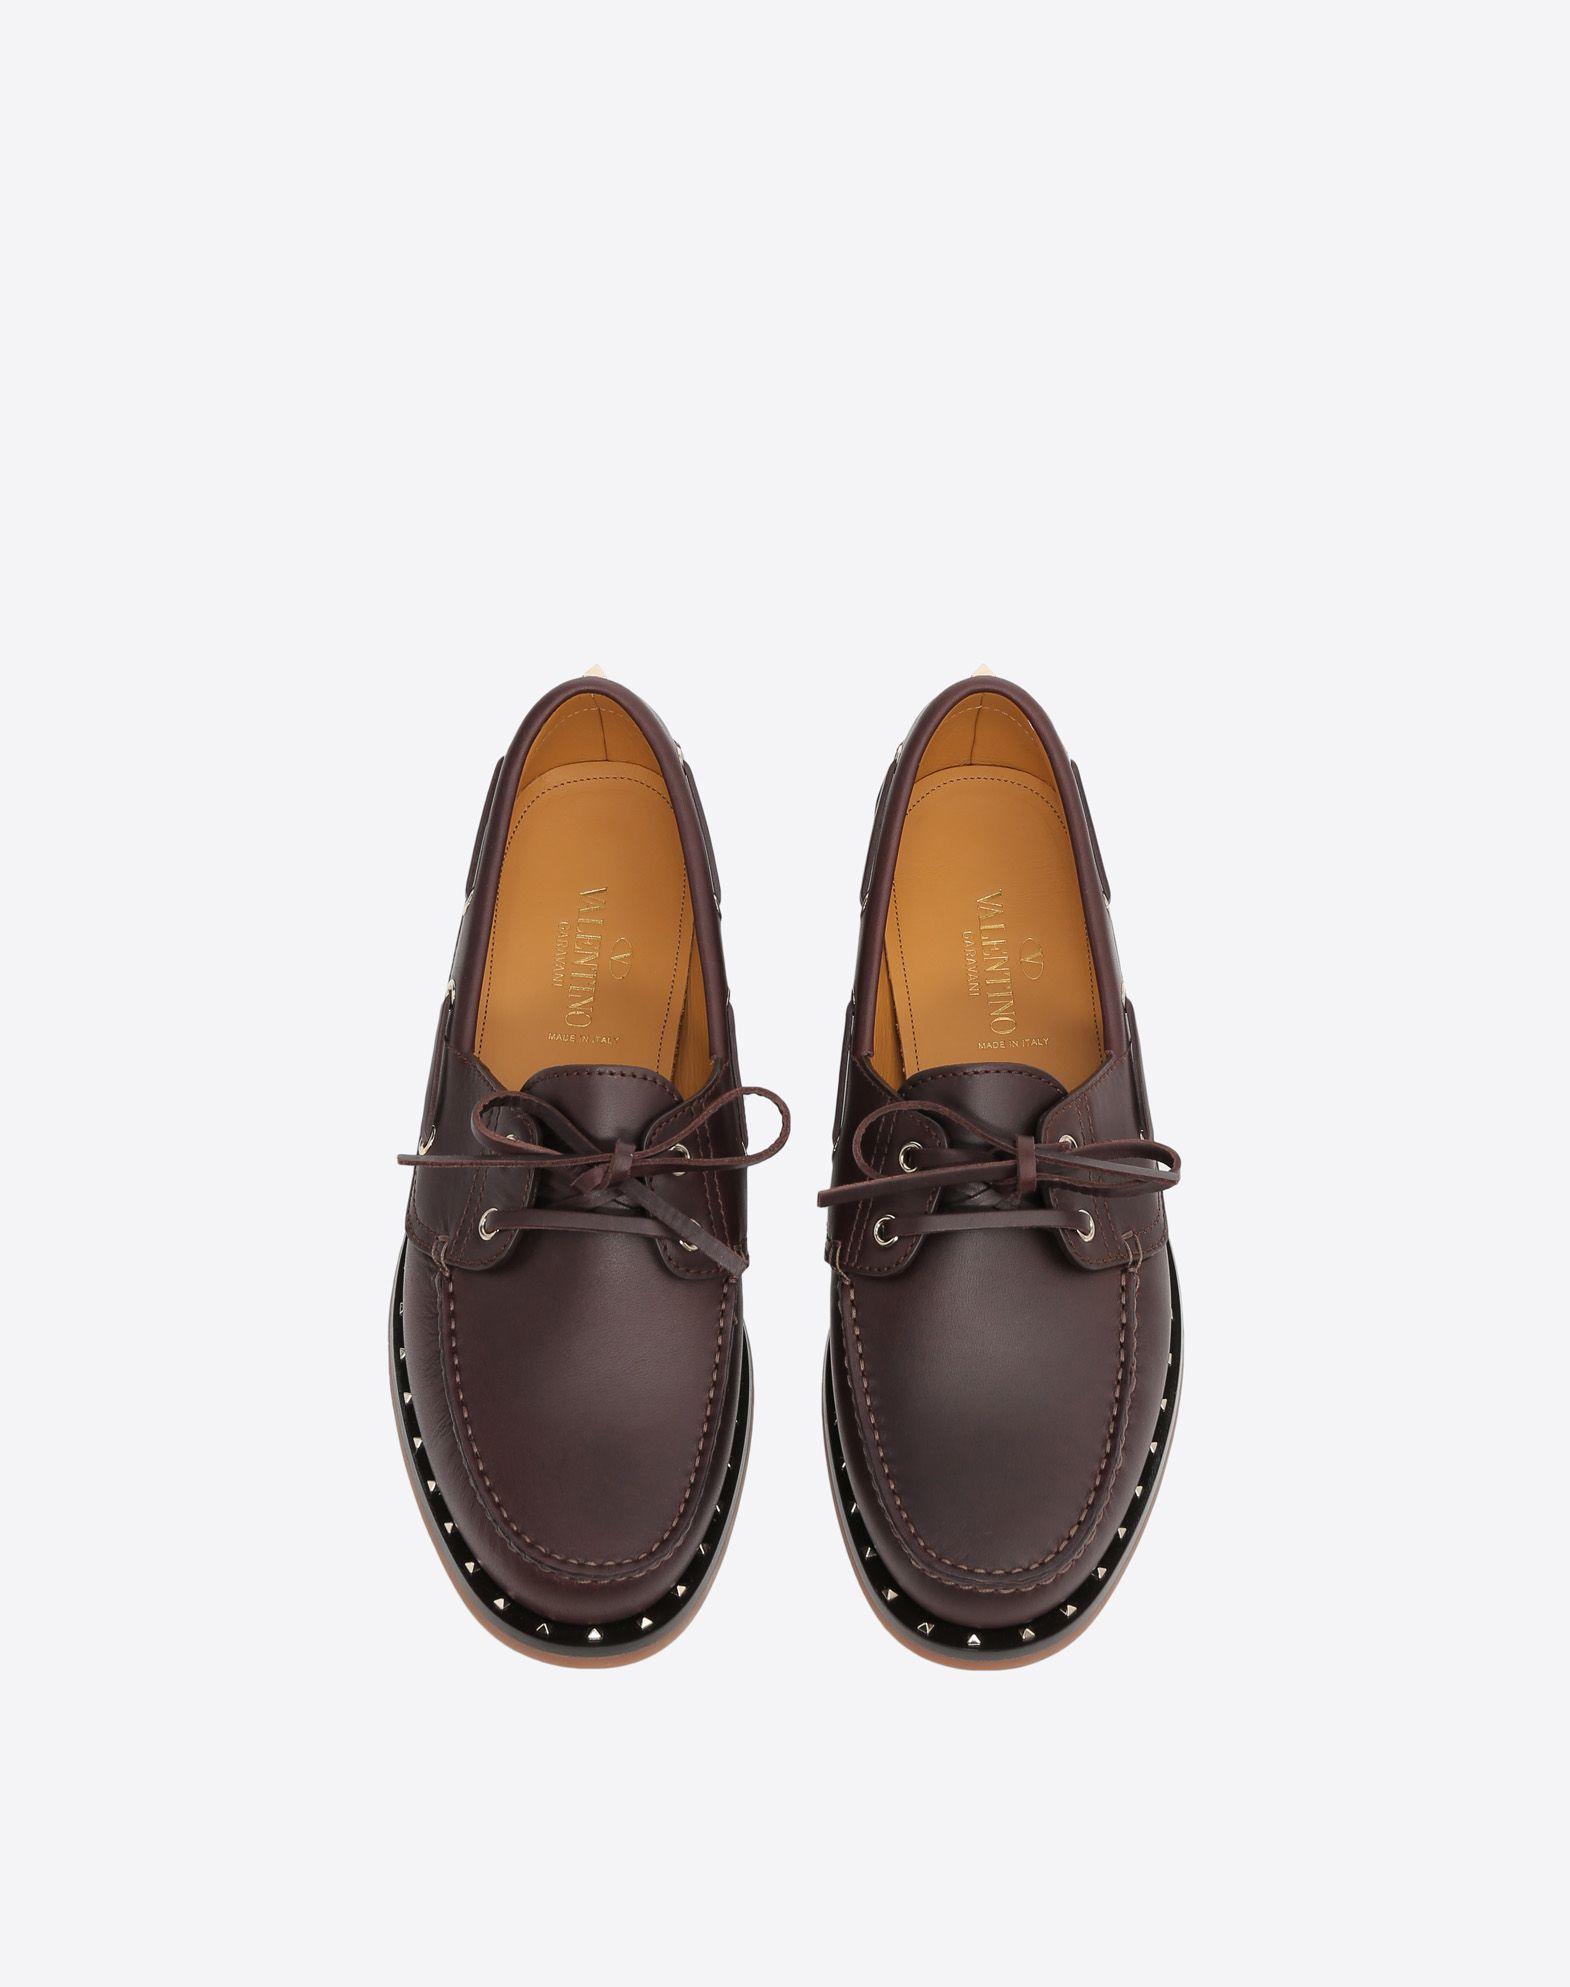 VALENTINO GARAVANI UOMO Soul Rockstud Boat shoes LOAFERS U e